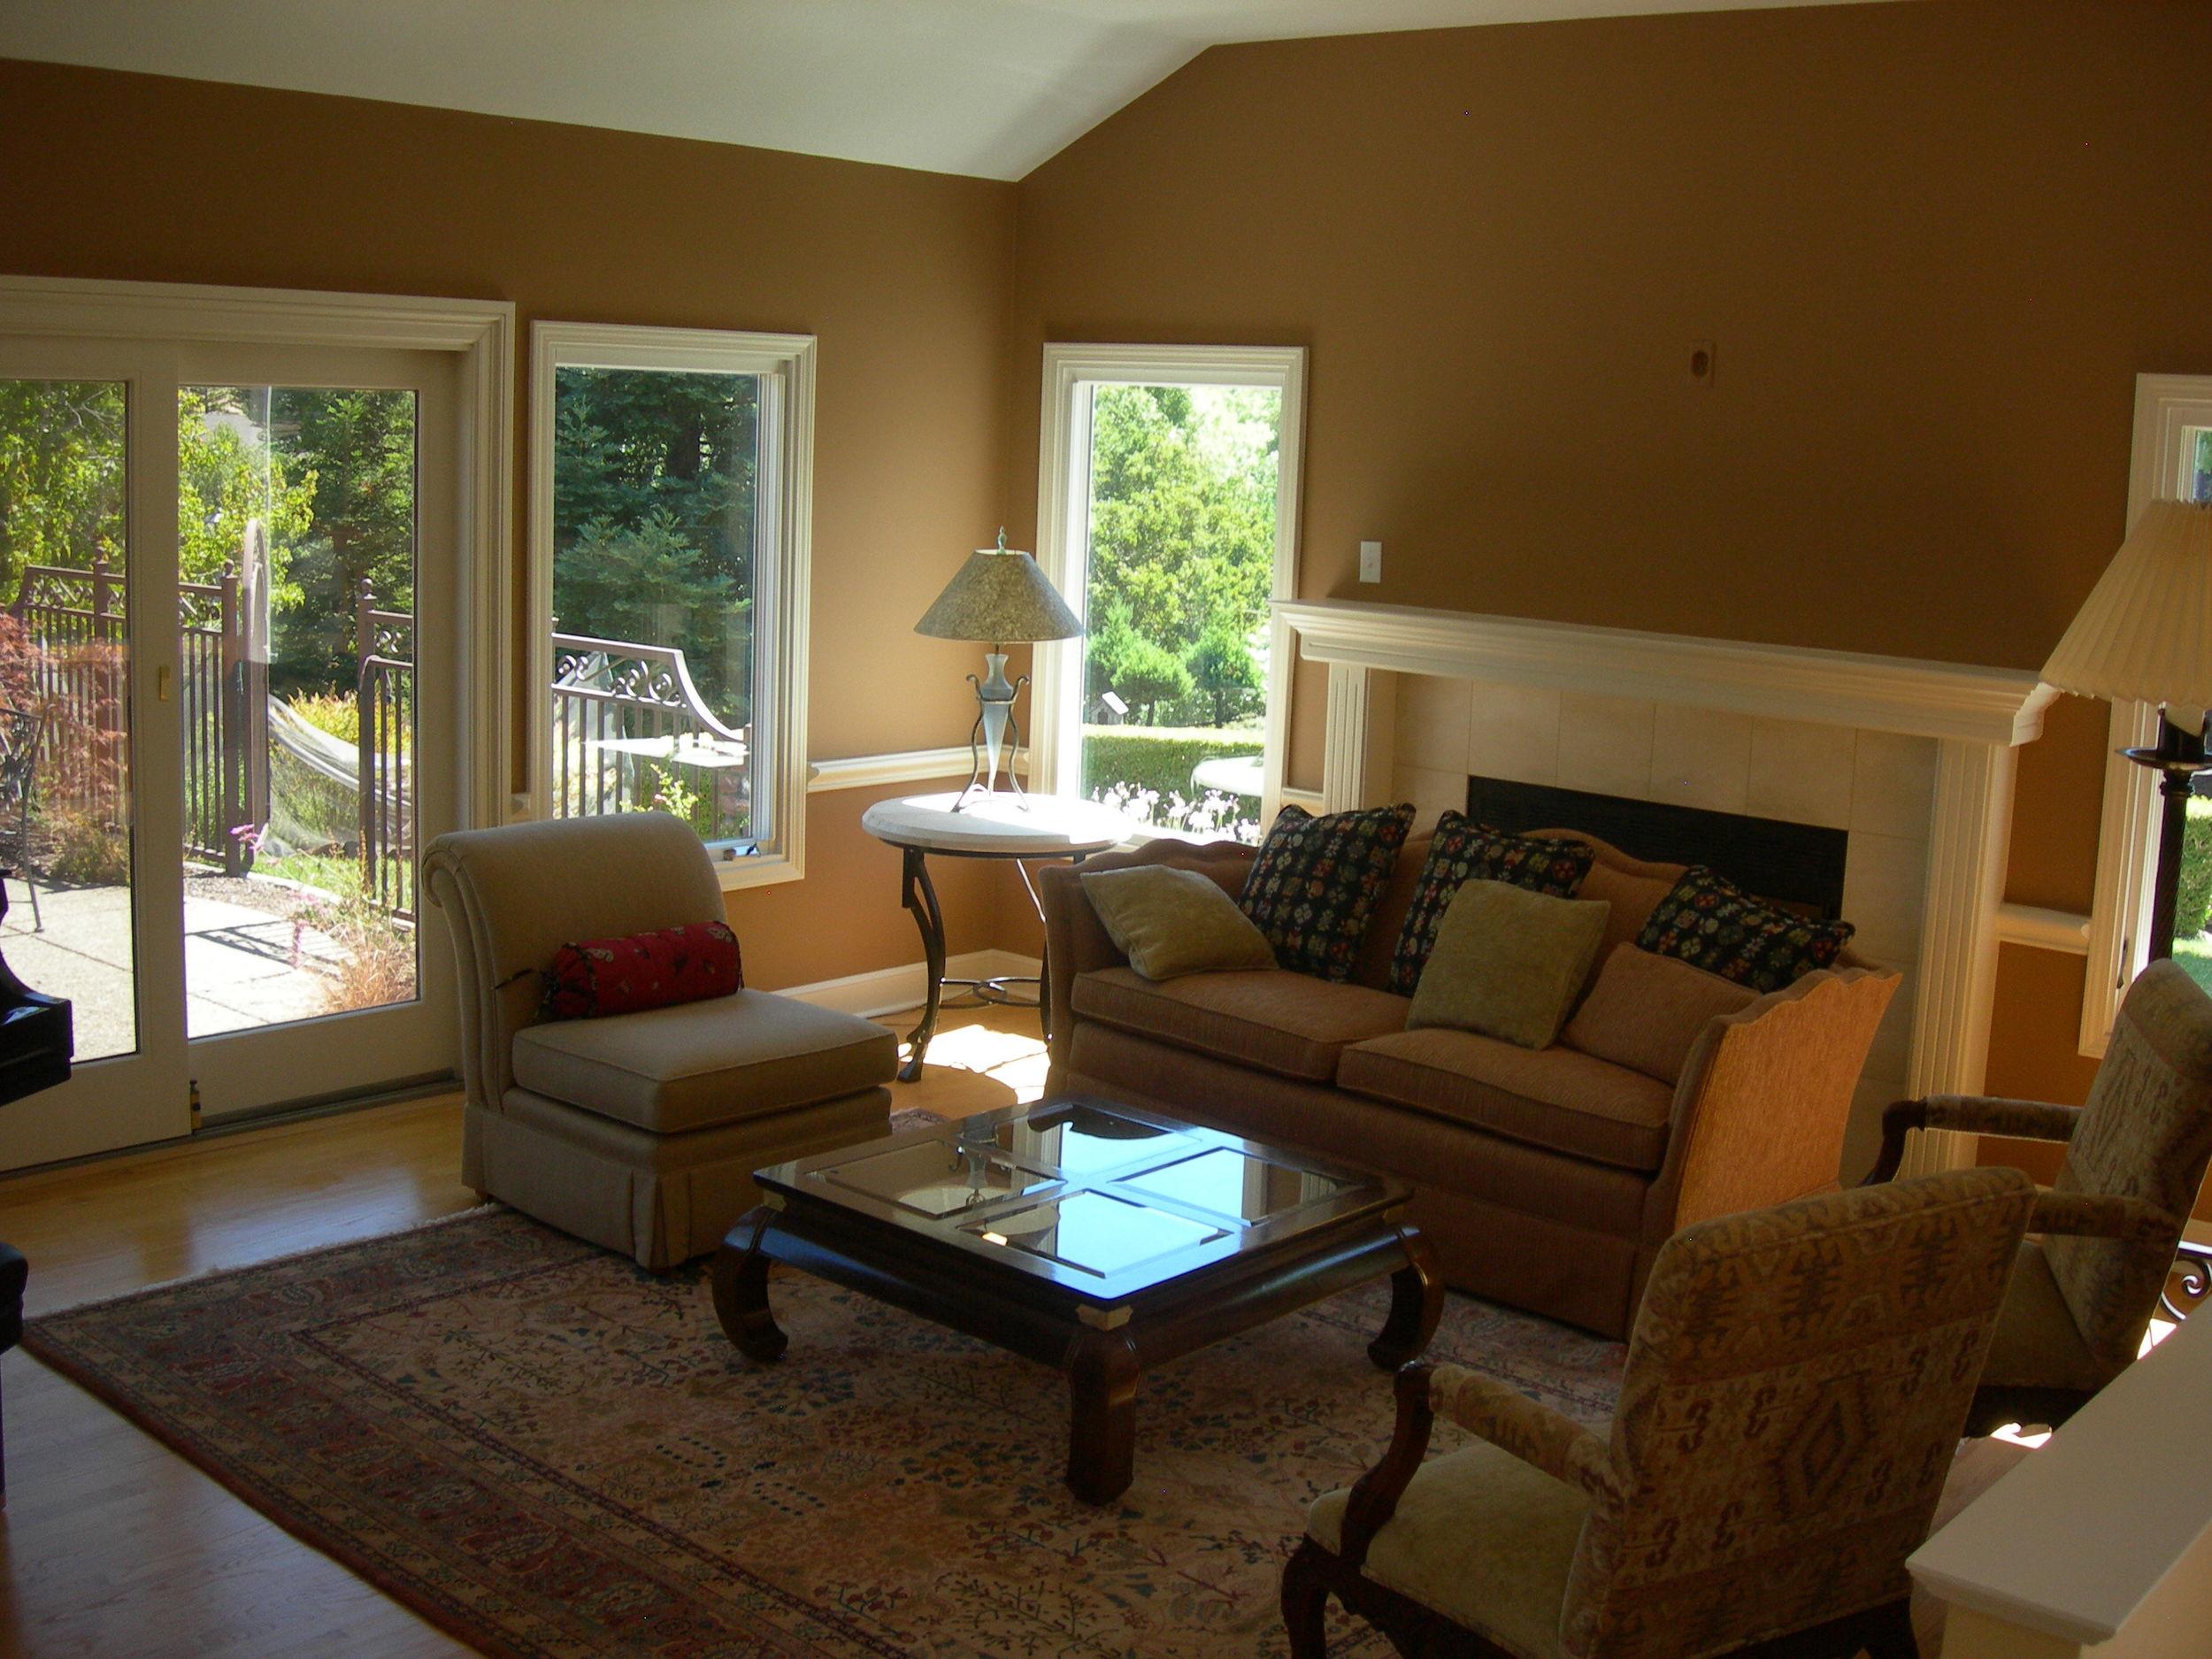 Home Interior.JPG